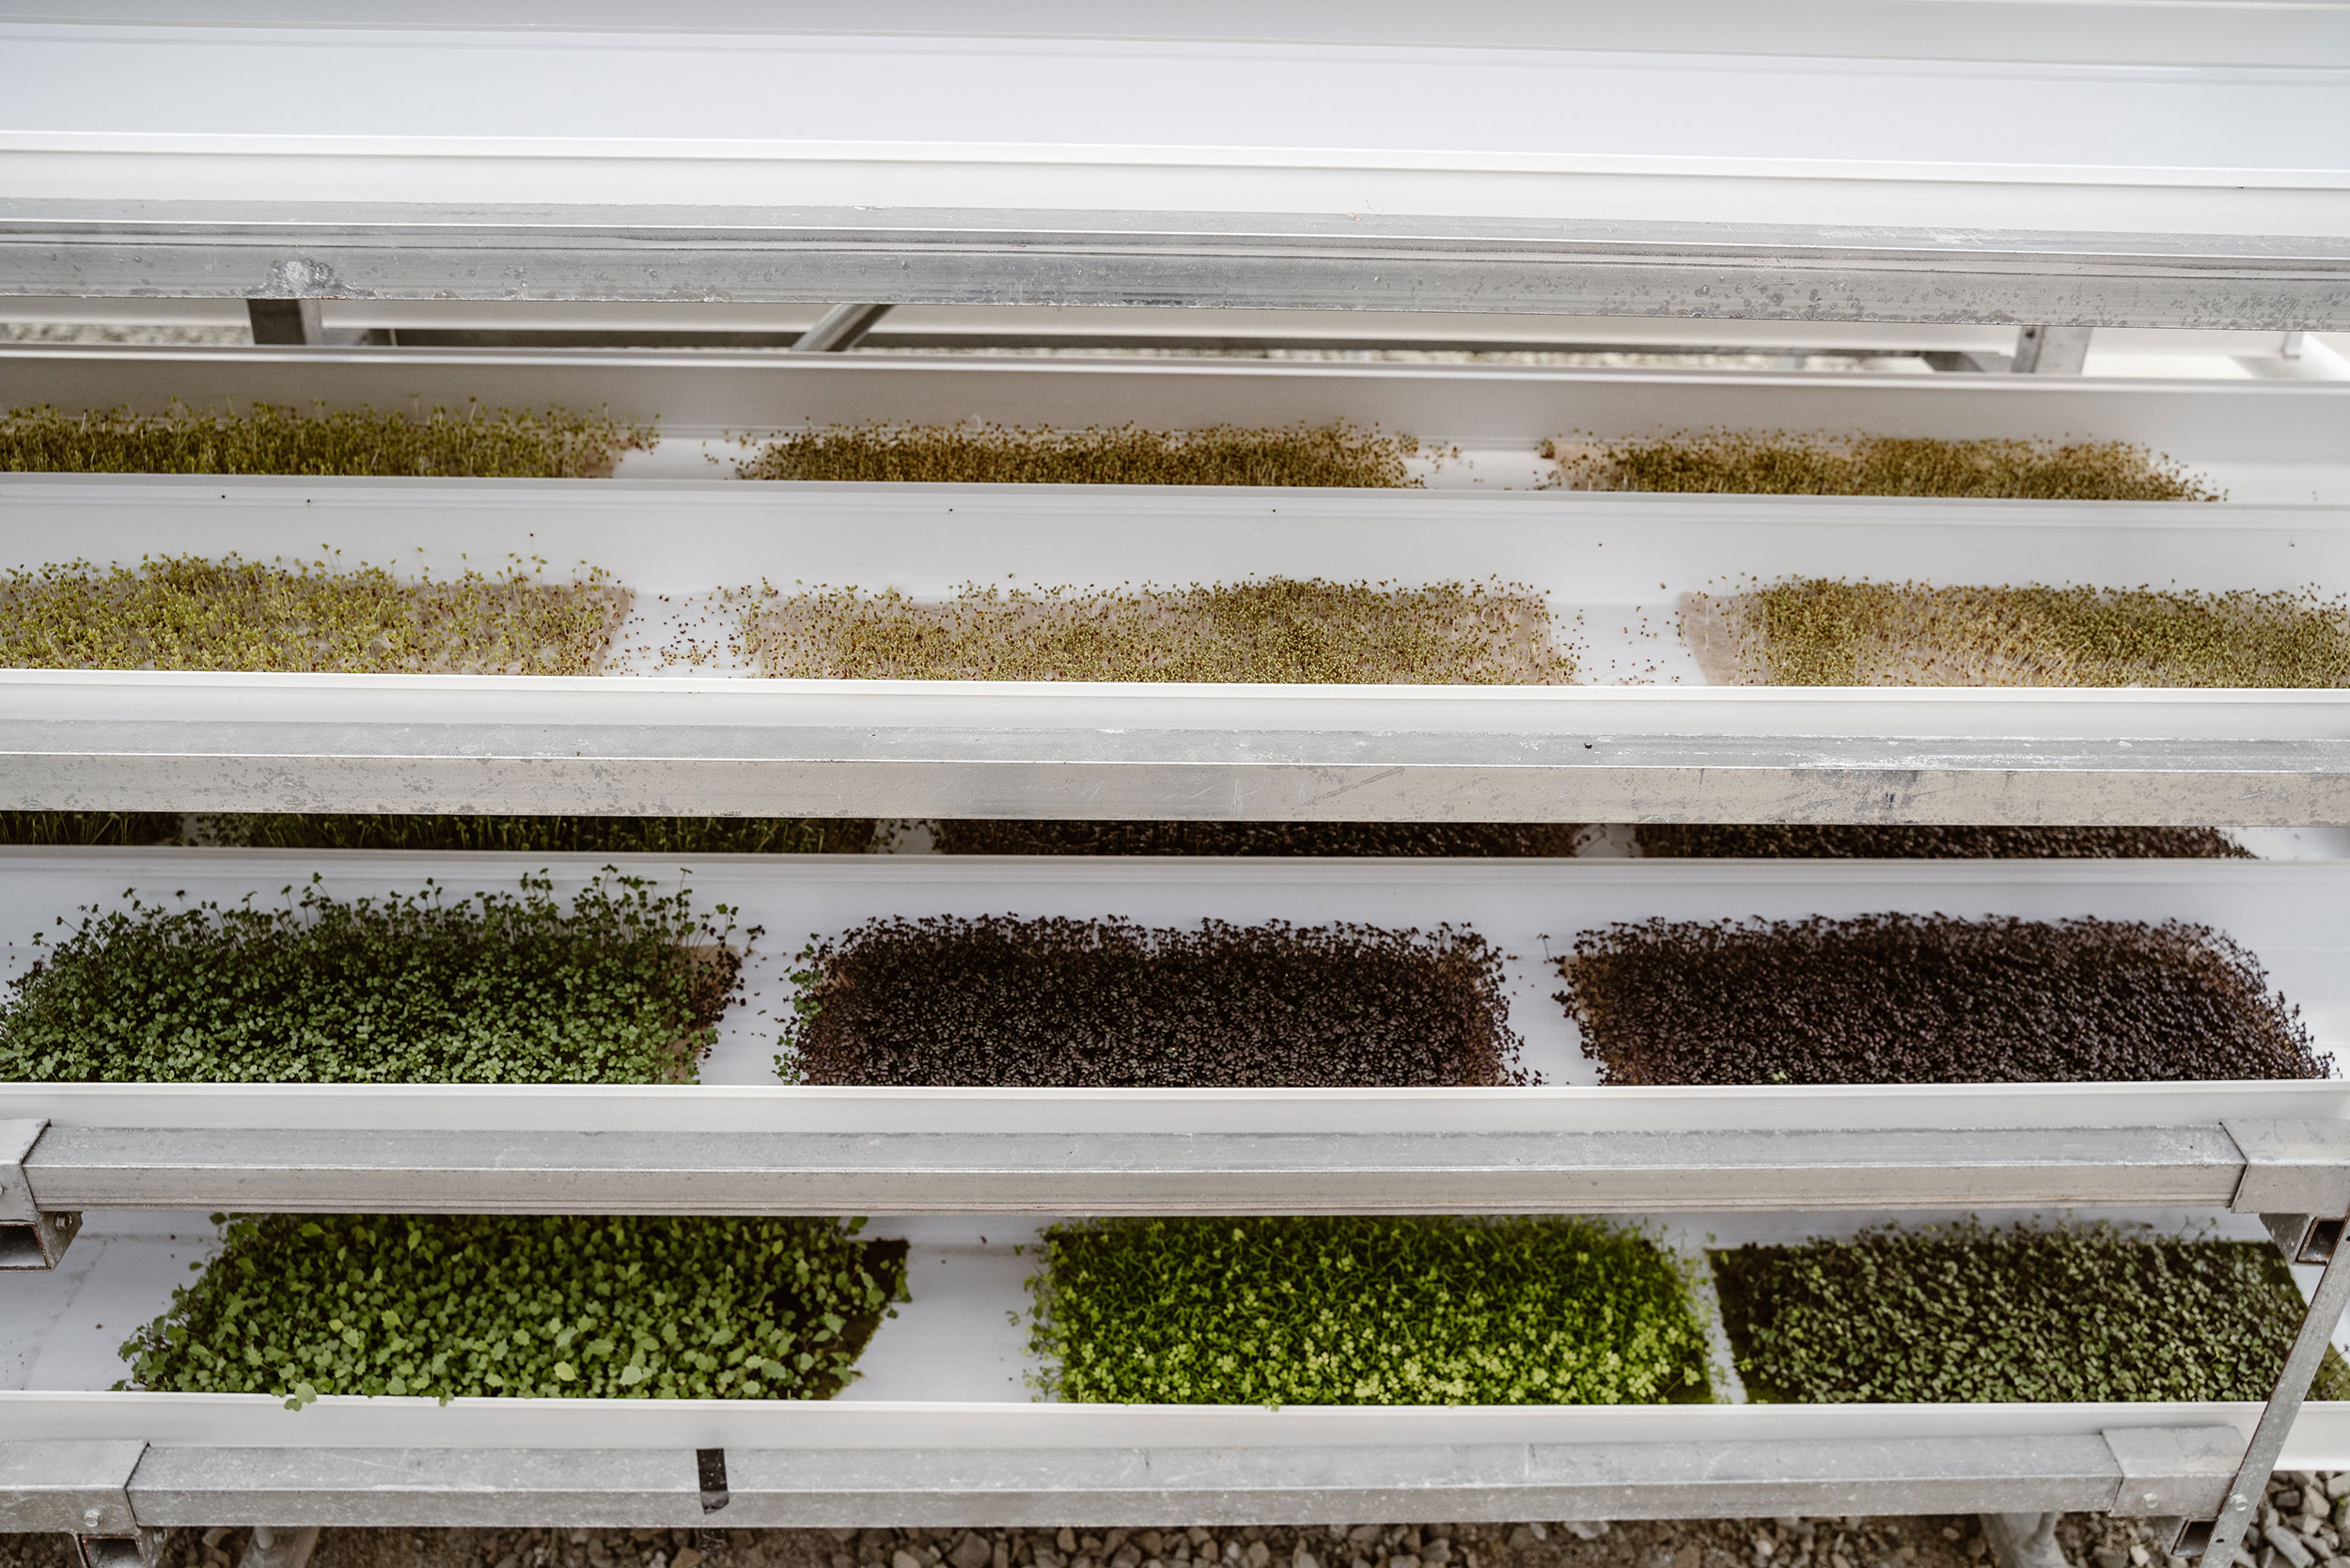 Herban-Produce-_-3-19-19-(39-of-55).jpg